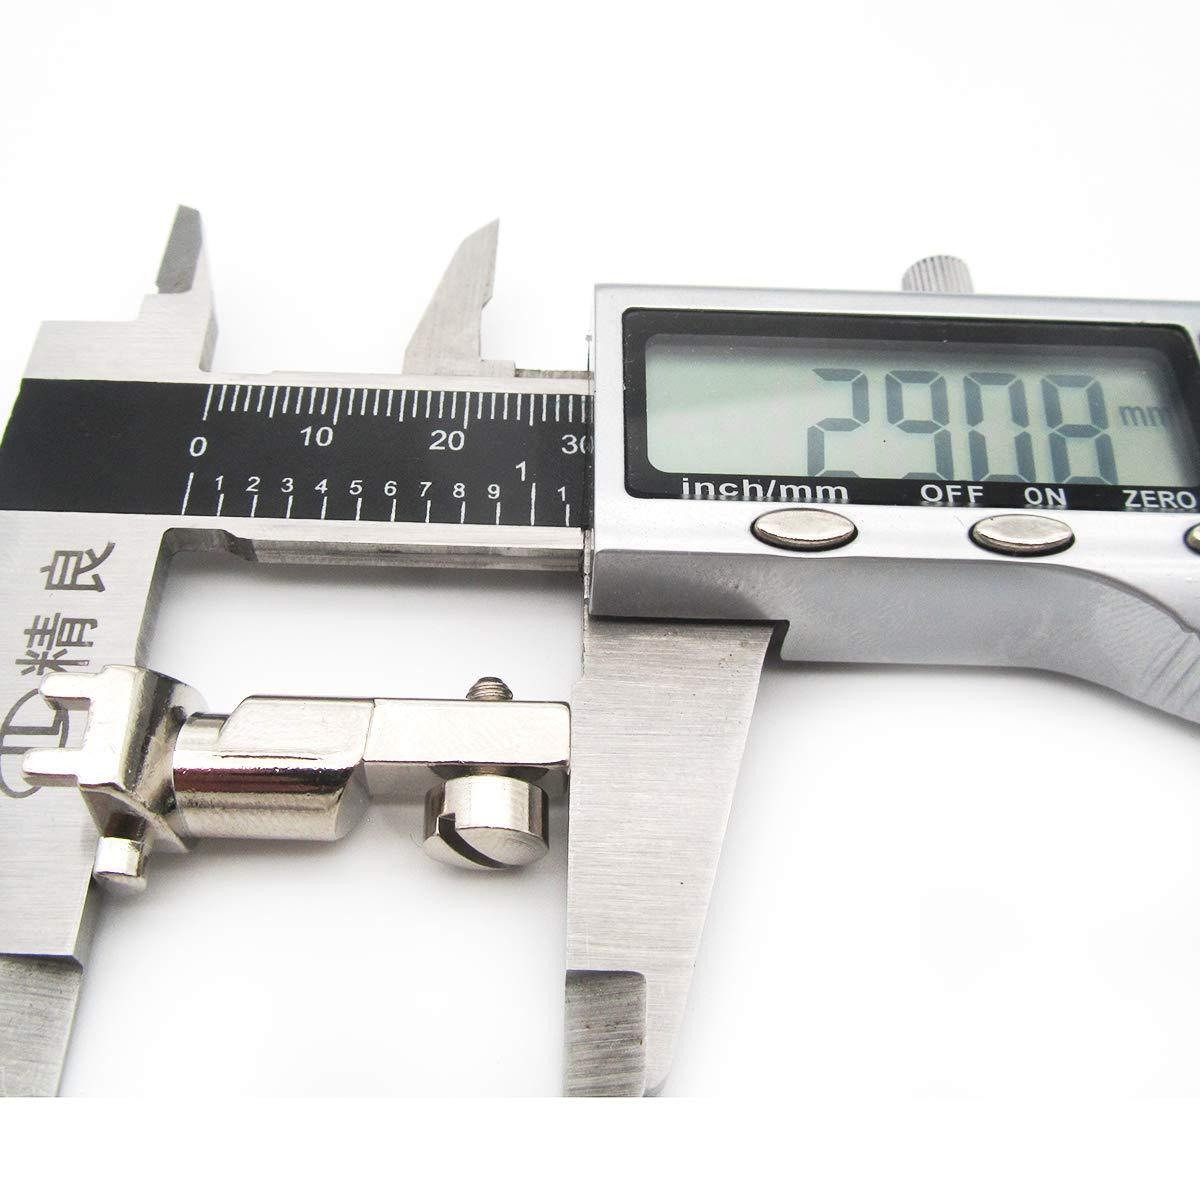 1 Set #CY-7307L+001947.70.00 Niedriger Schaft Kunpen 0,8 cm Saumfu/ß-Fit f/ür Bernina Old Style N/ähmaschine